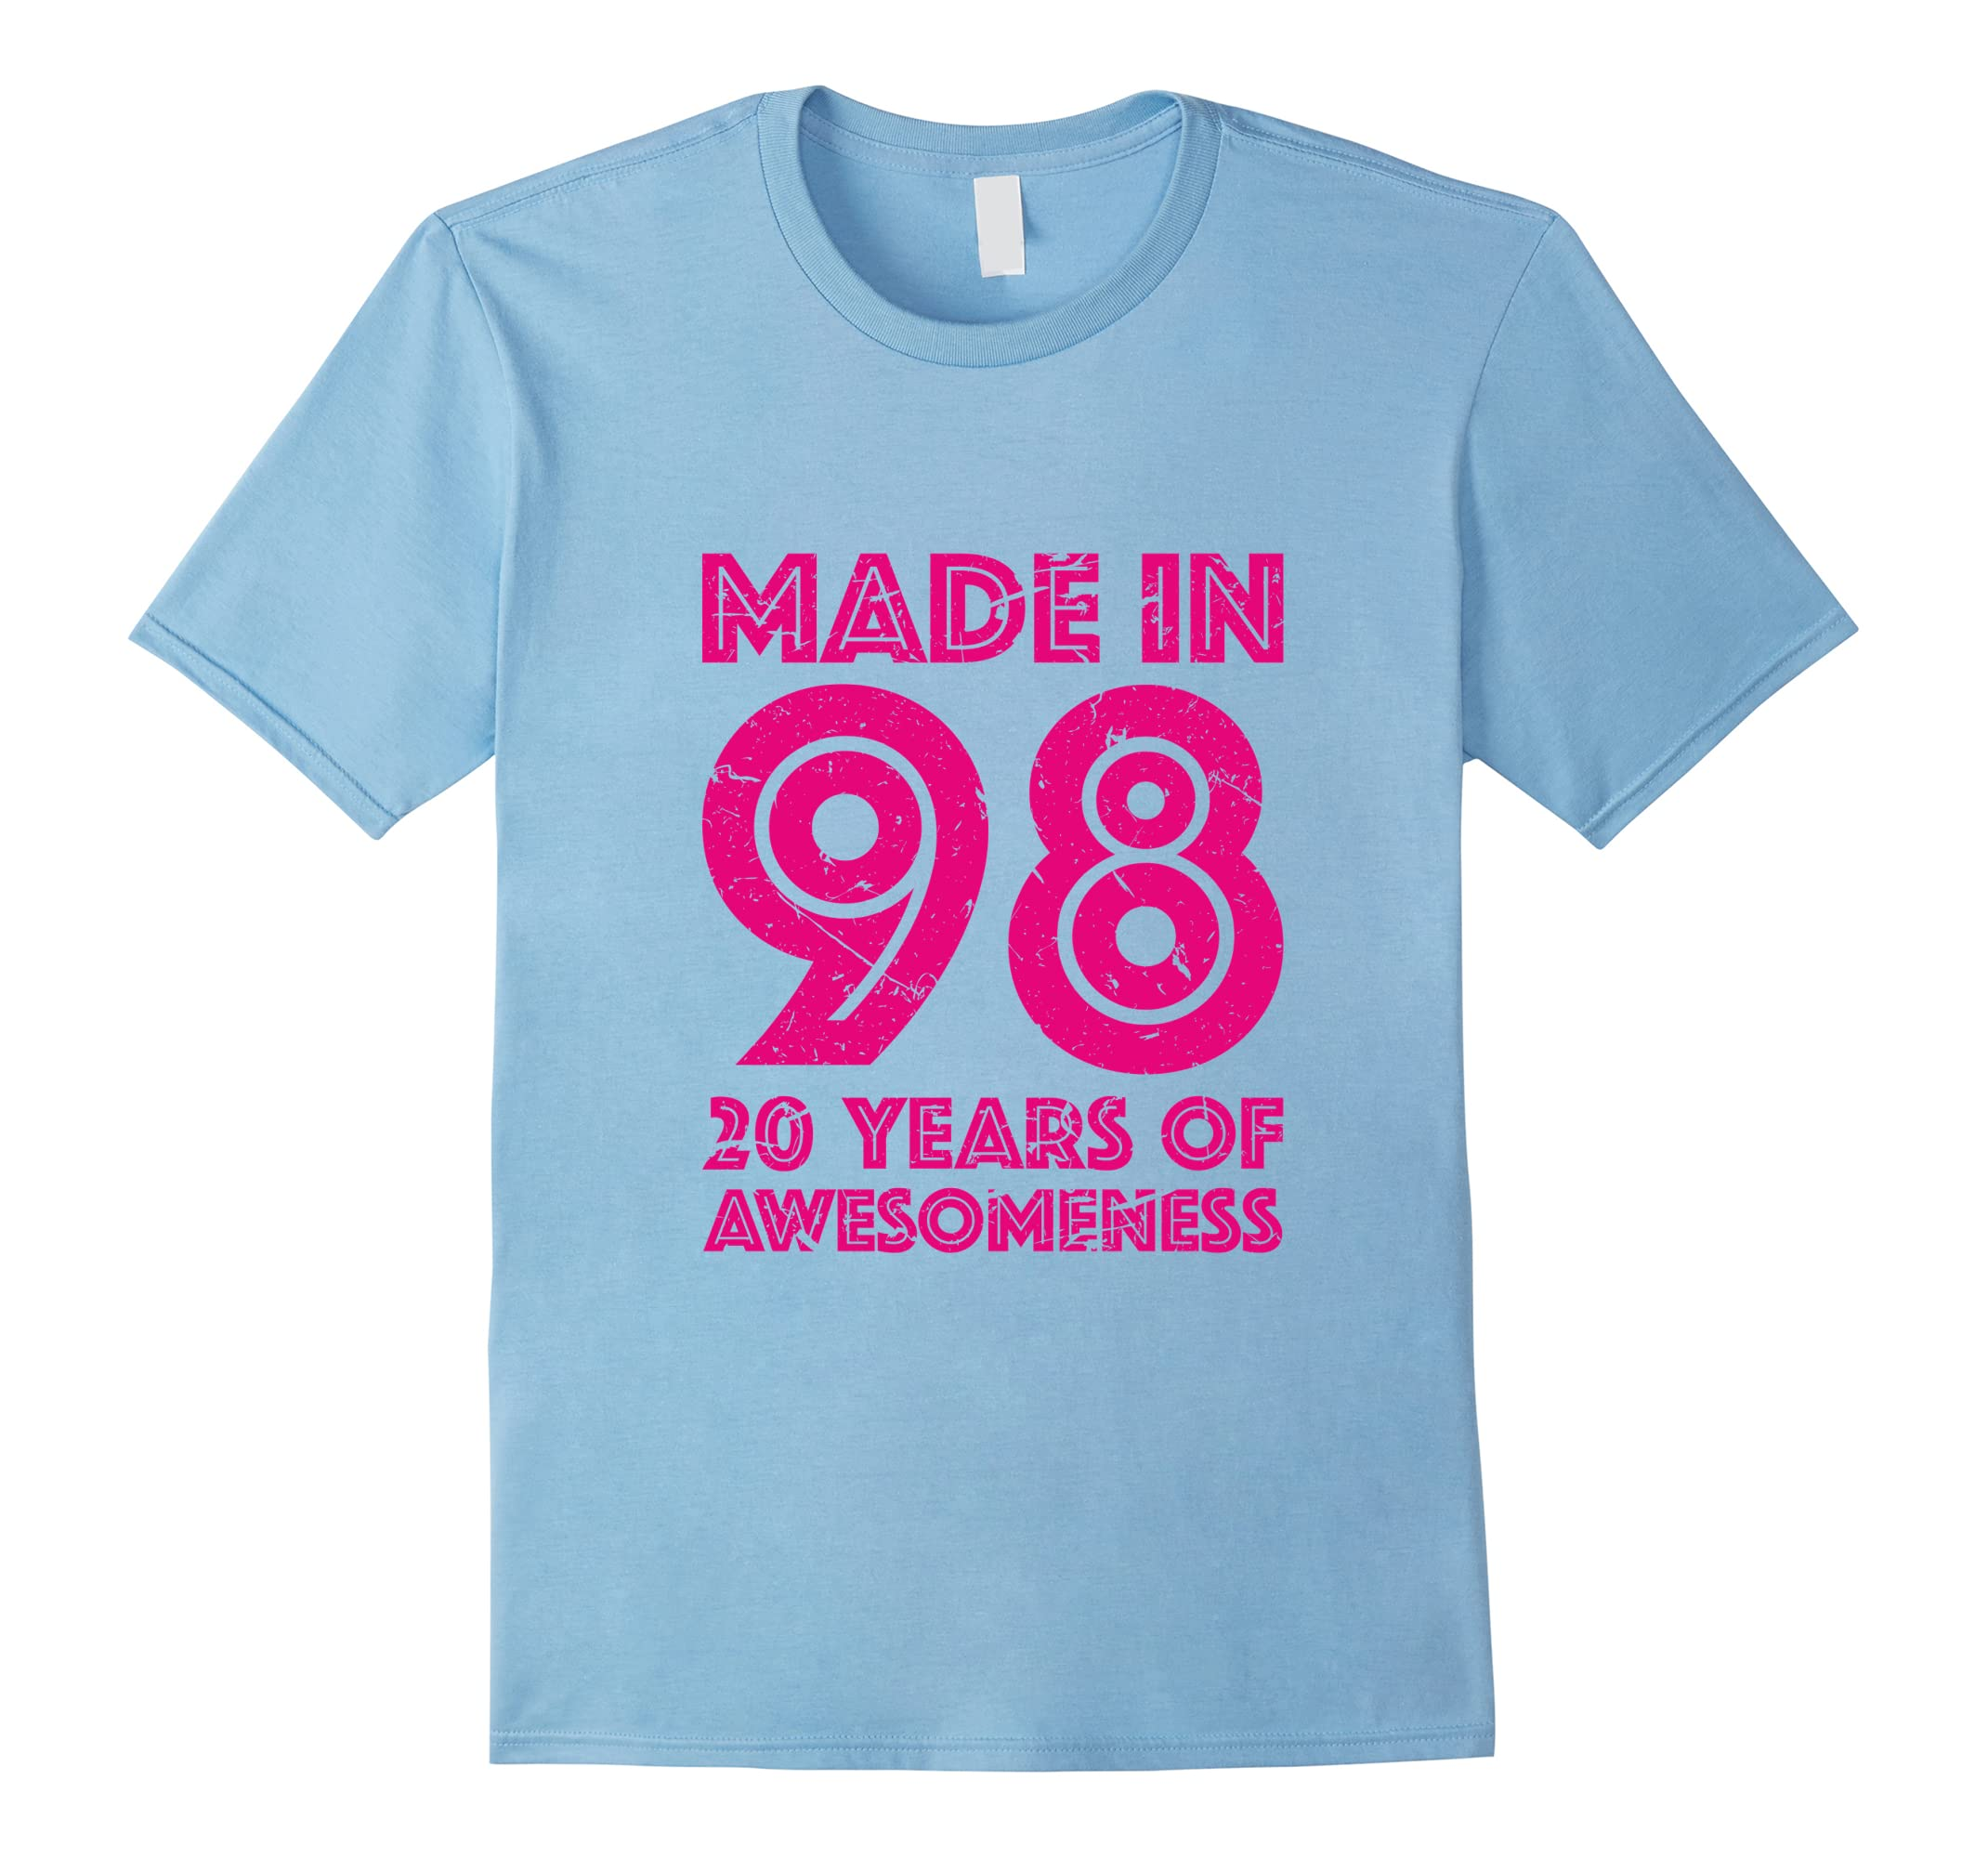 20th Birthday Shirt Gift Girls Age 20 Year Old Women Tshirt-RT